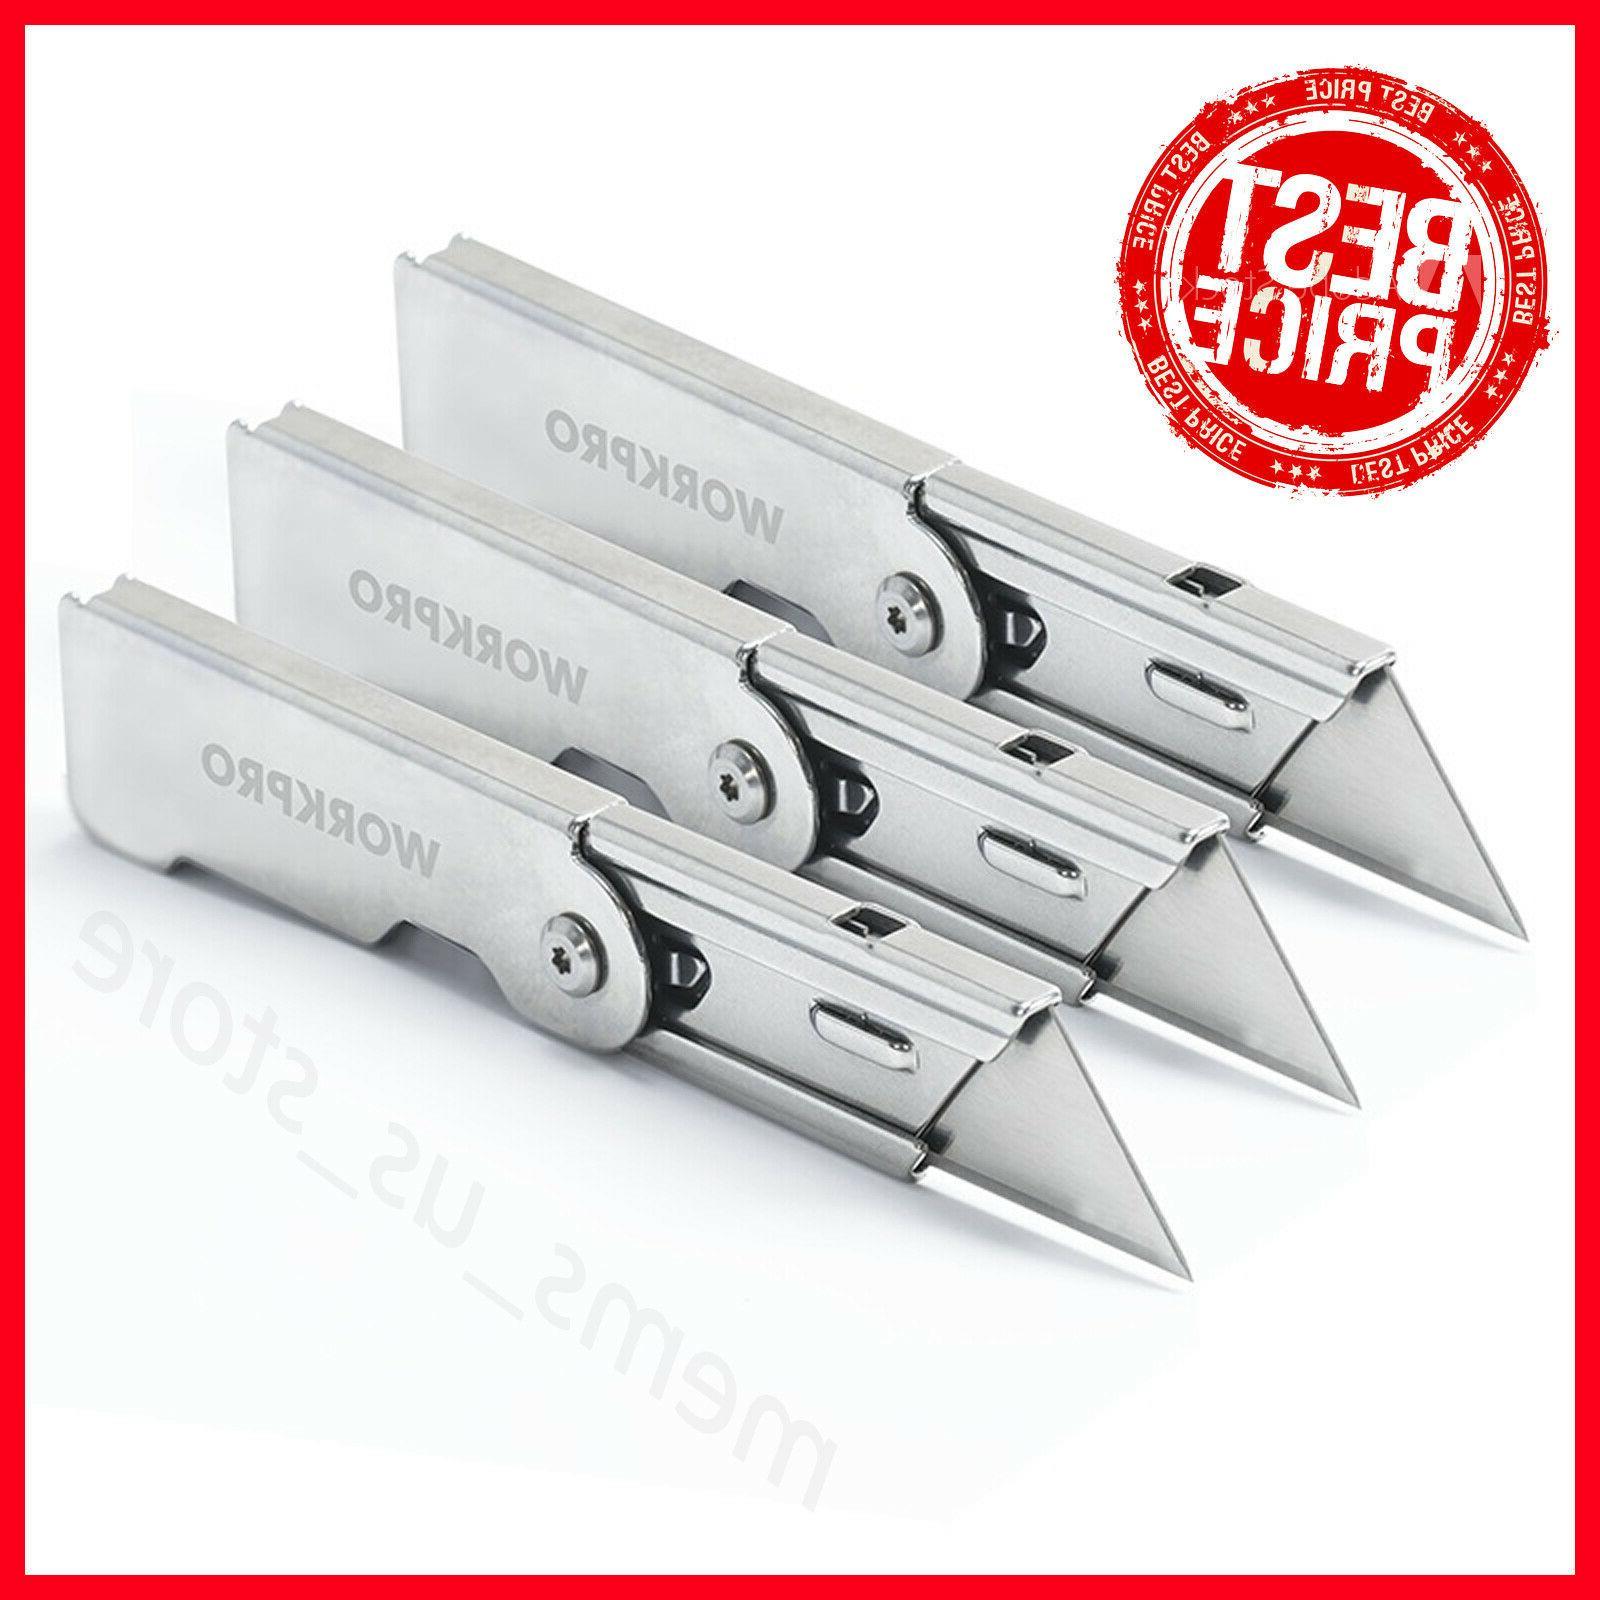 WORKPRO 3PC Folding Utility Knife Set Stainless steel Knife